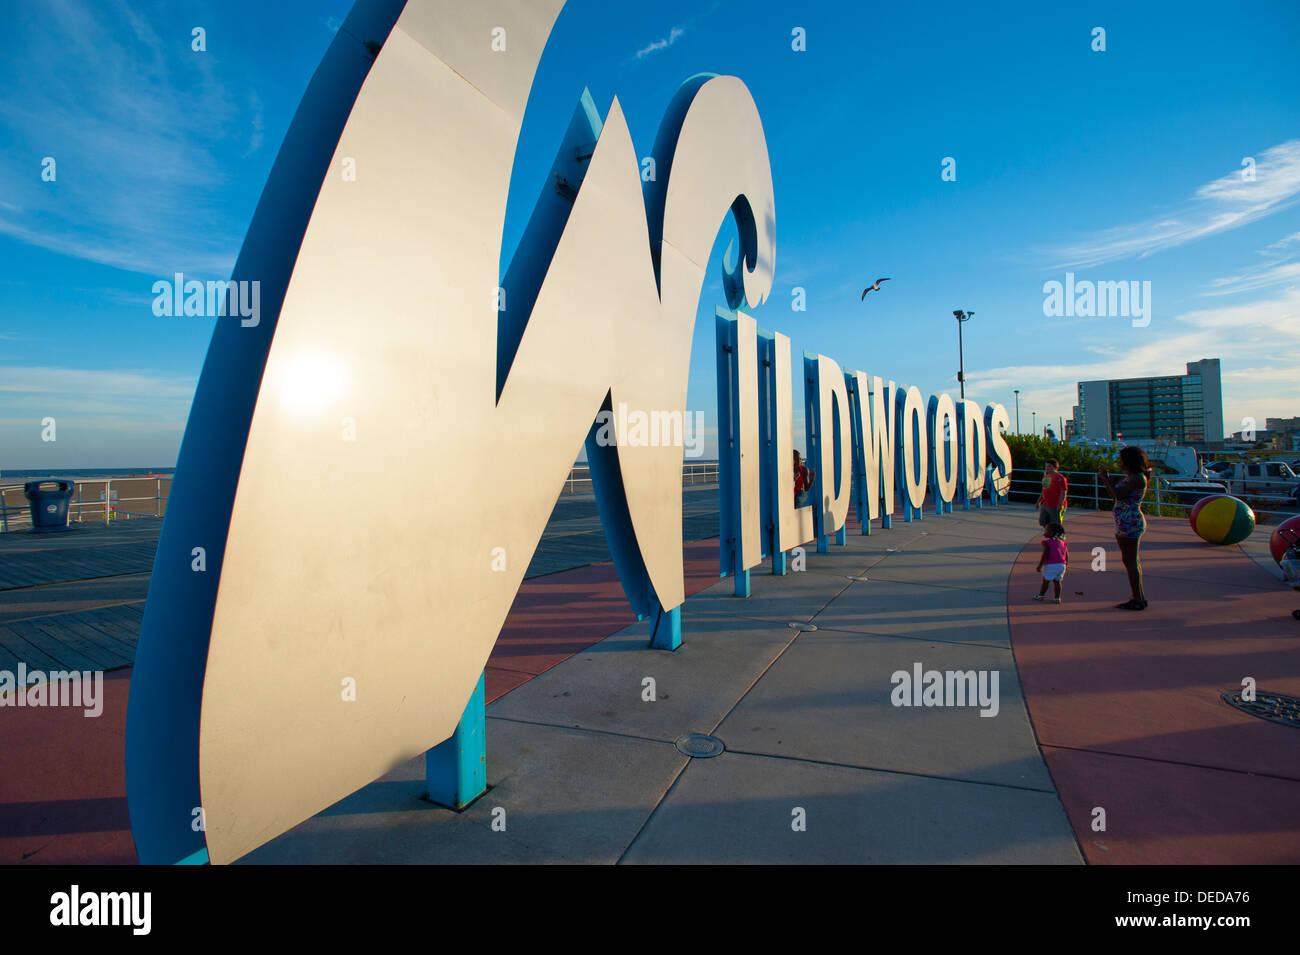 usa-new-jersey-nj-wildwoods-boardwalk-an